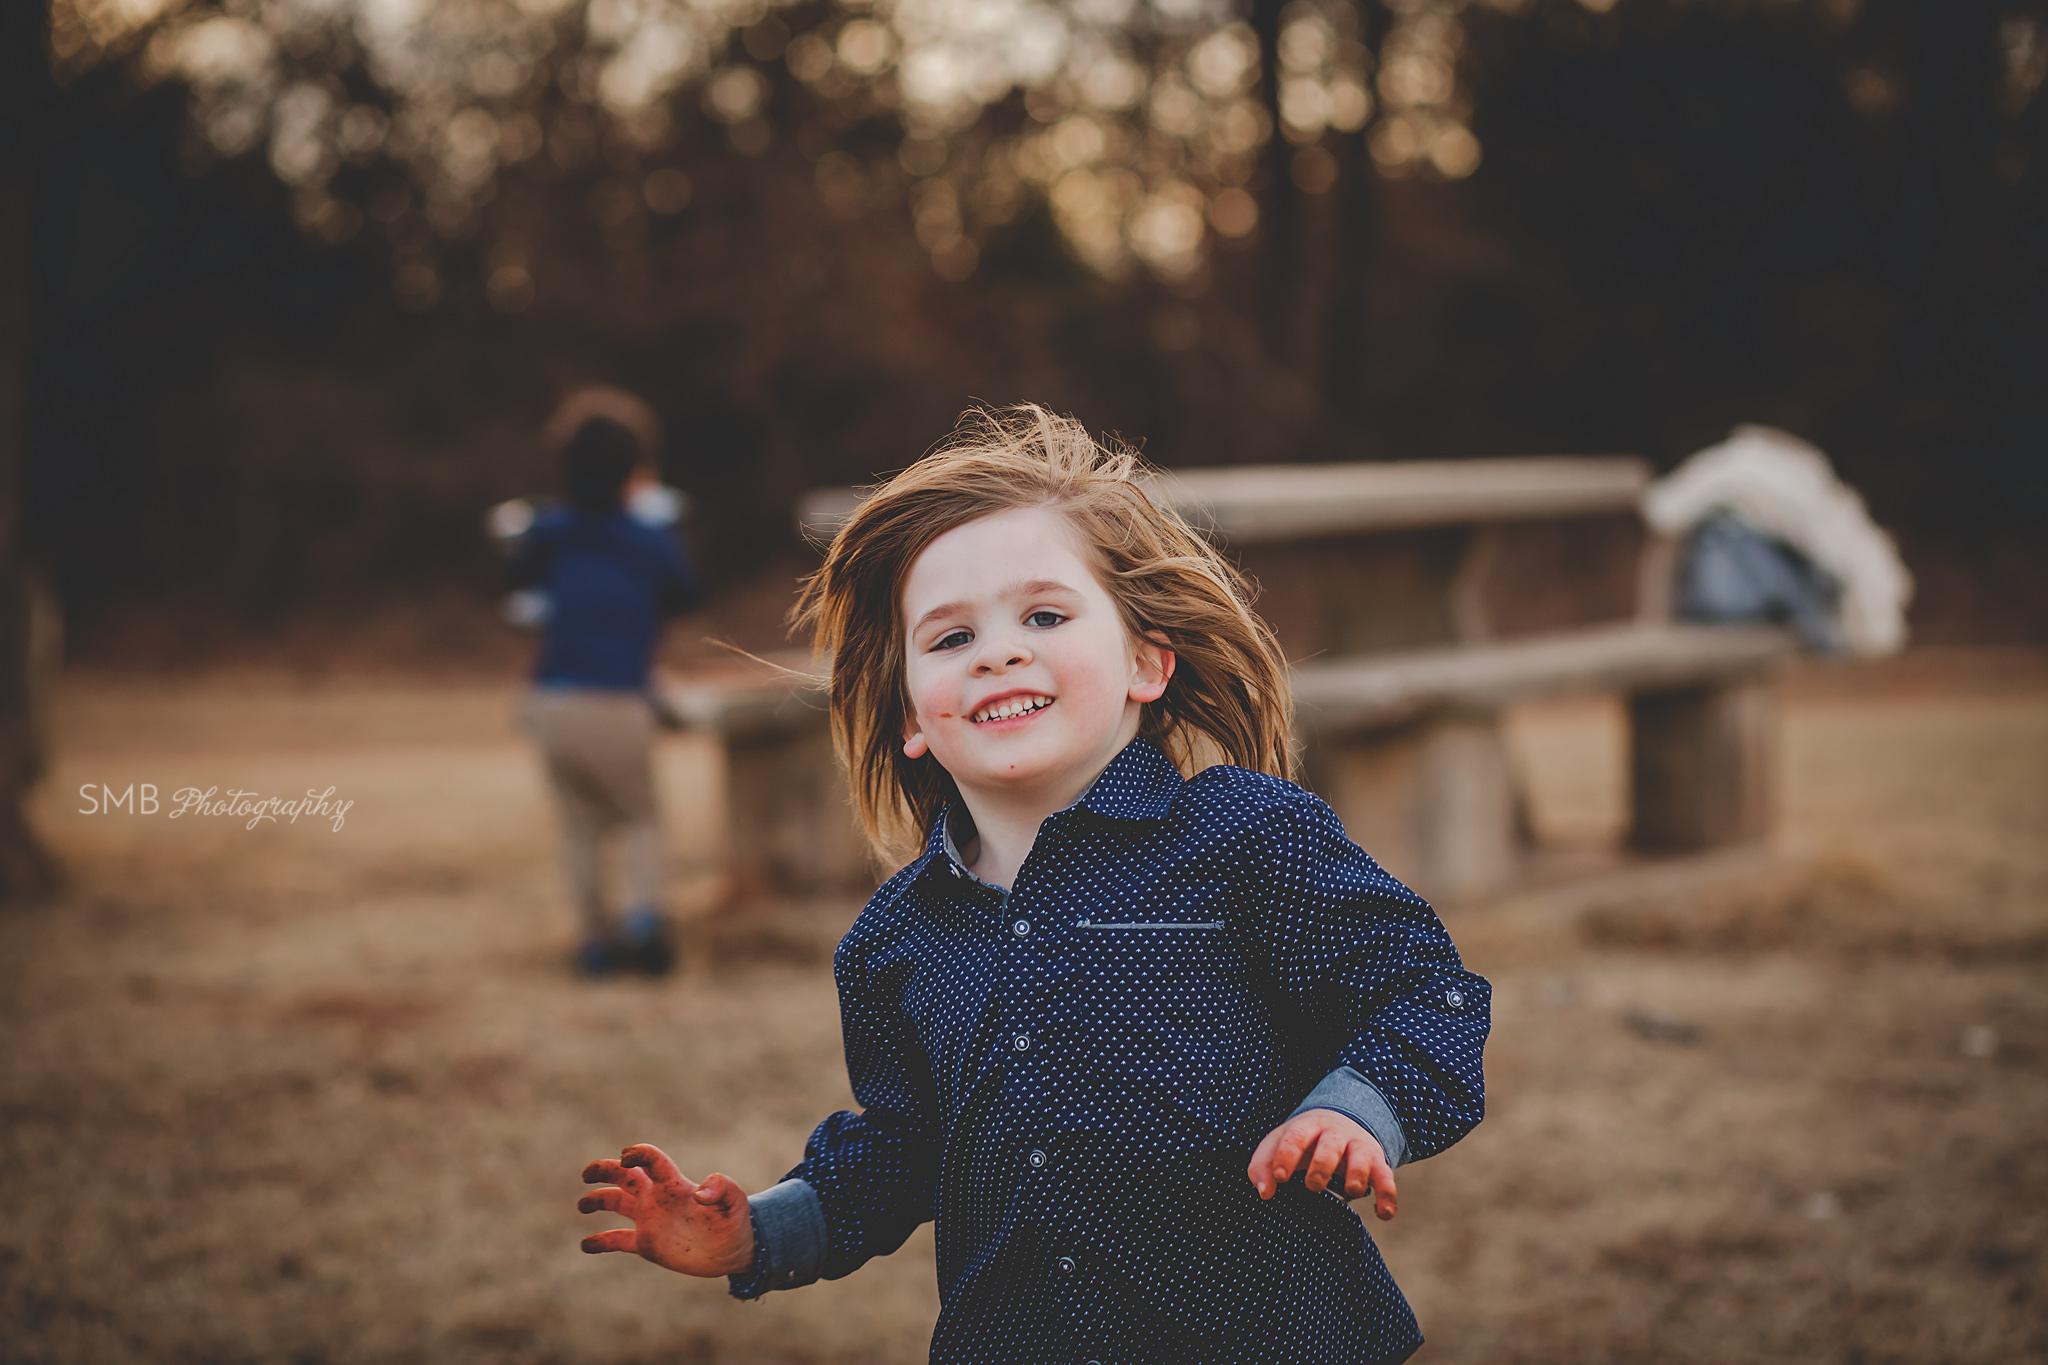 Little boy running having fun